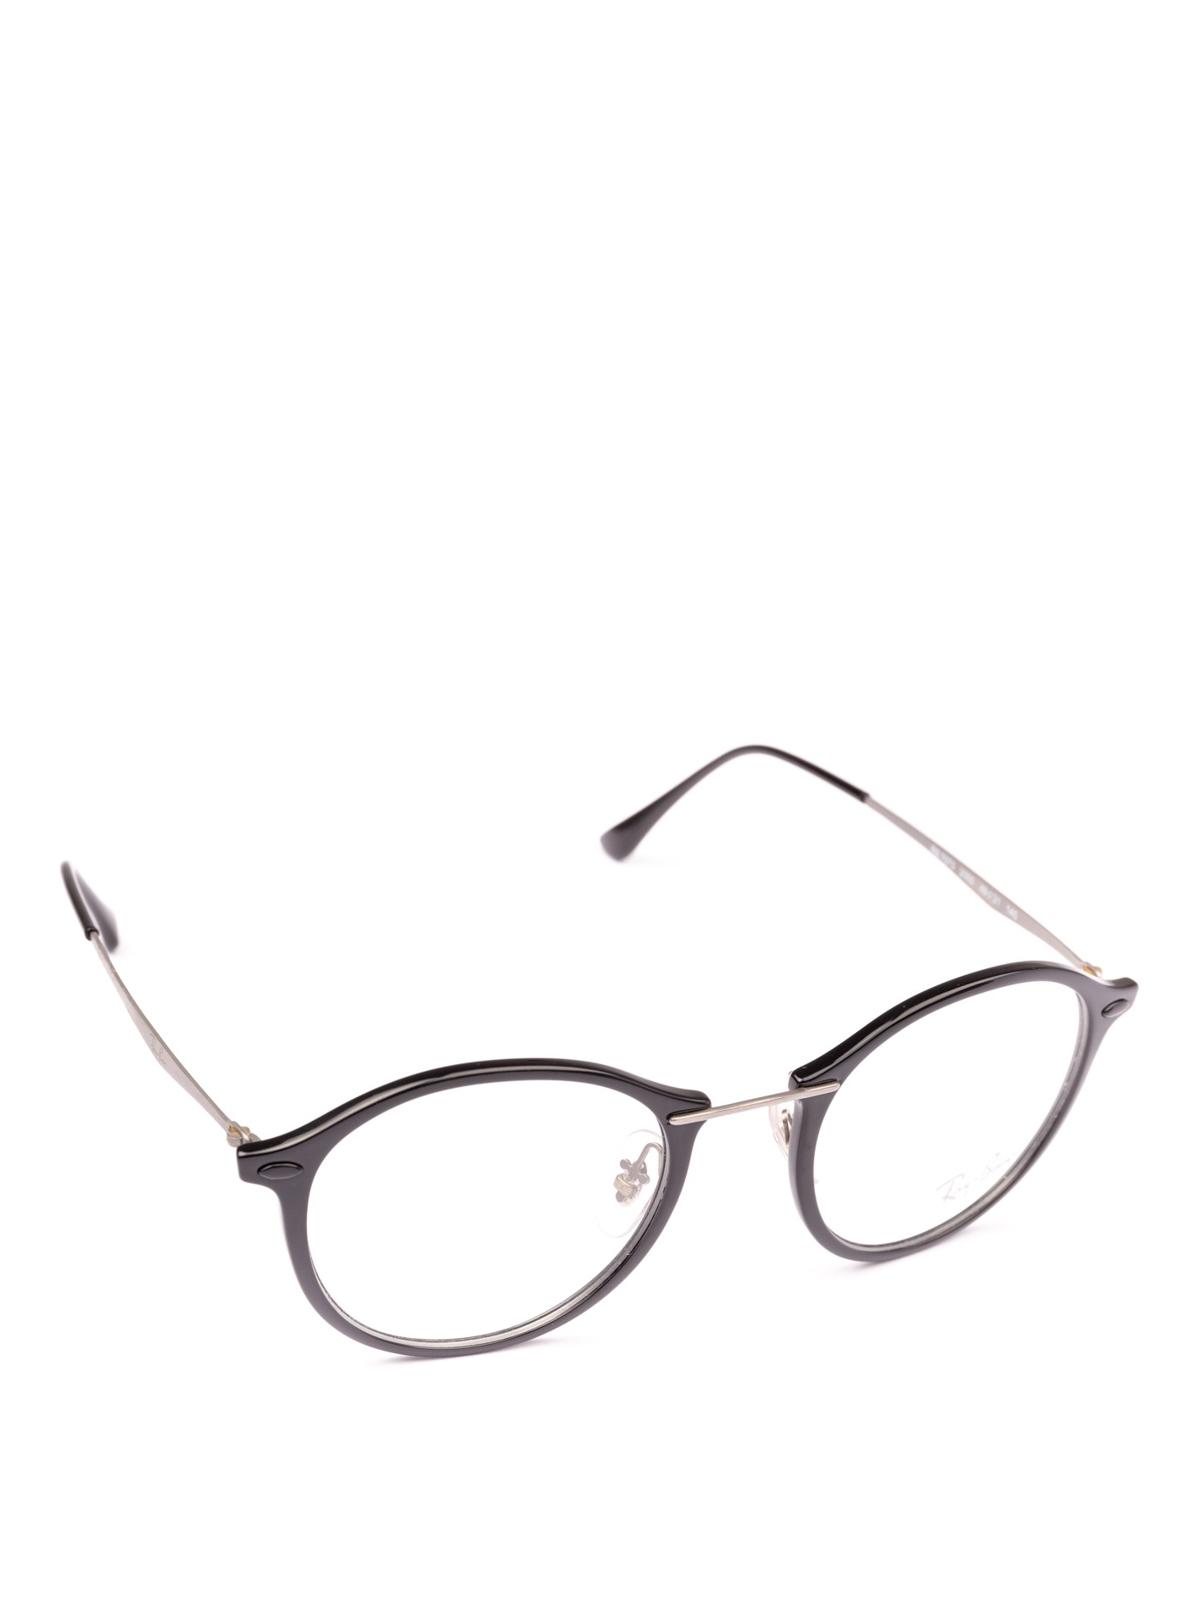 5d4d835cfc Ray Ban - Black acetate and metal circle glasses - glasses - RB7073 2000